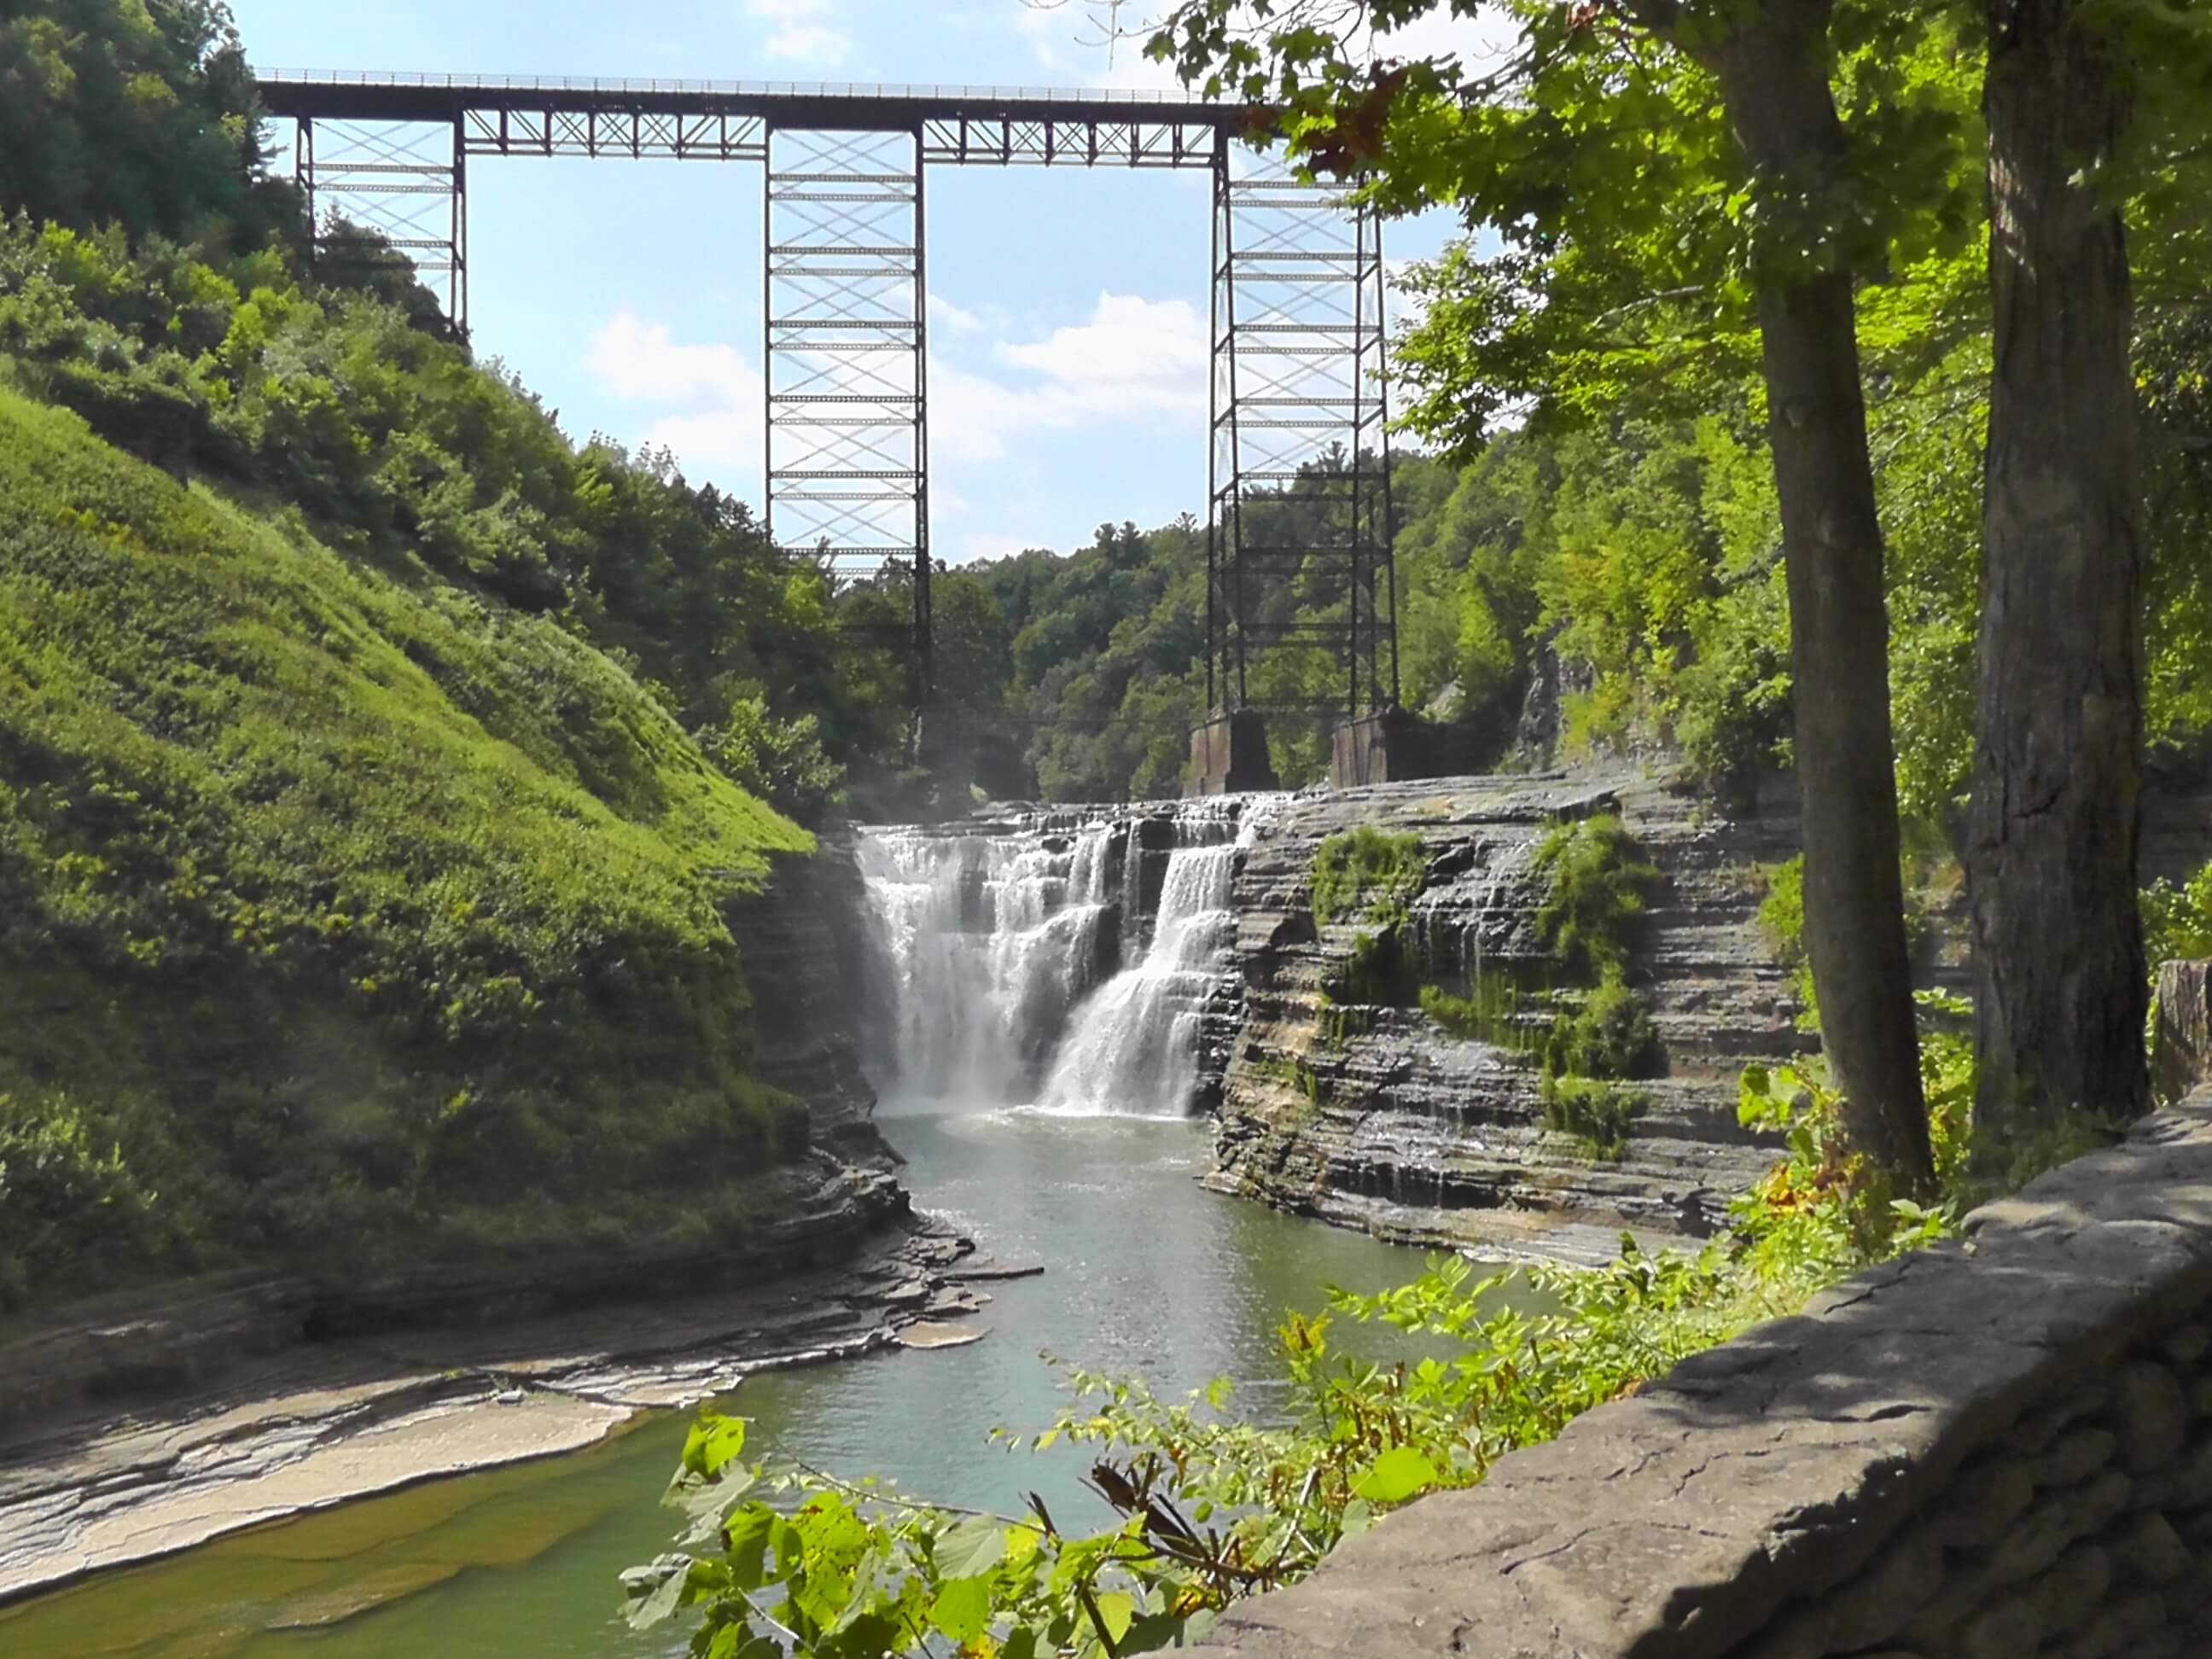 Upper Falls, Letchworth State Park, New York